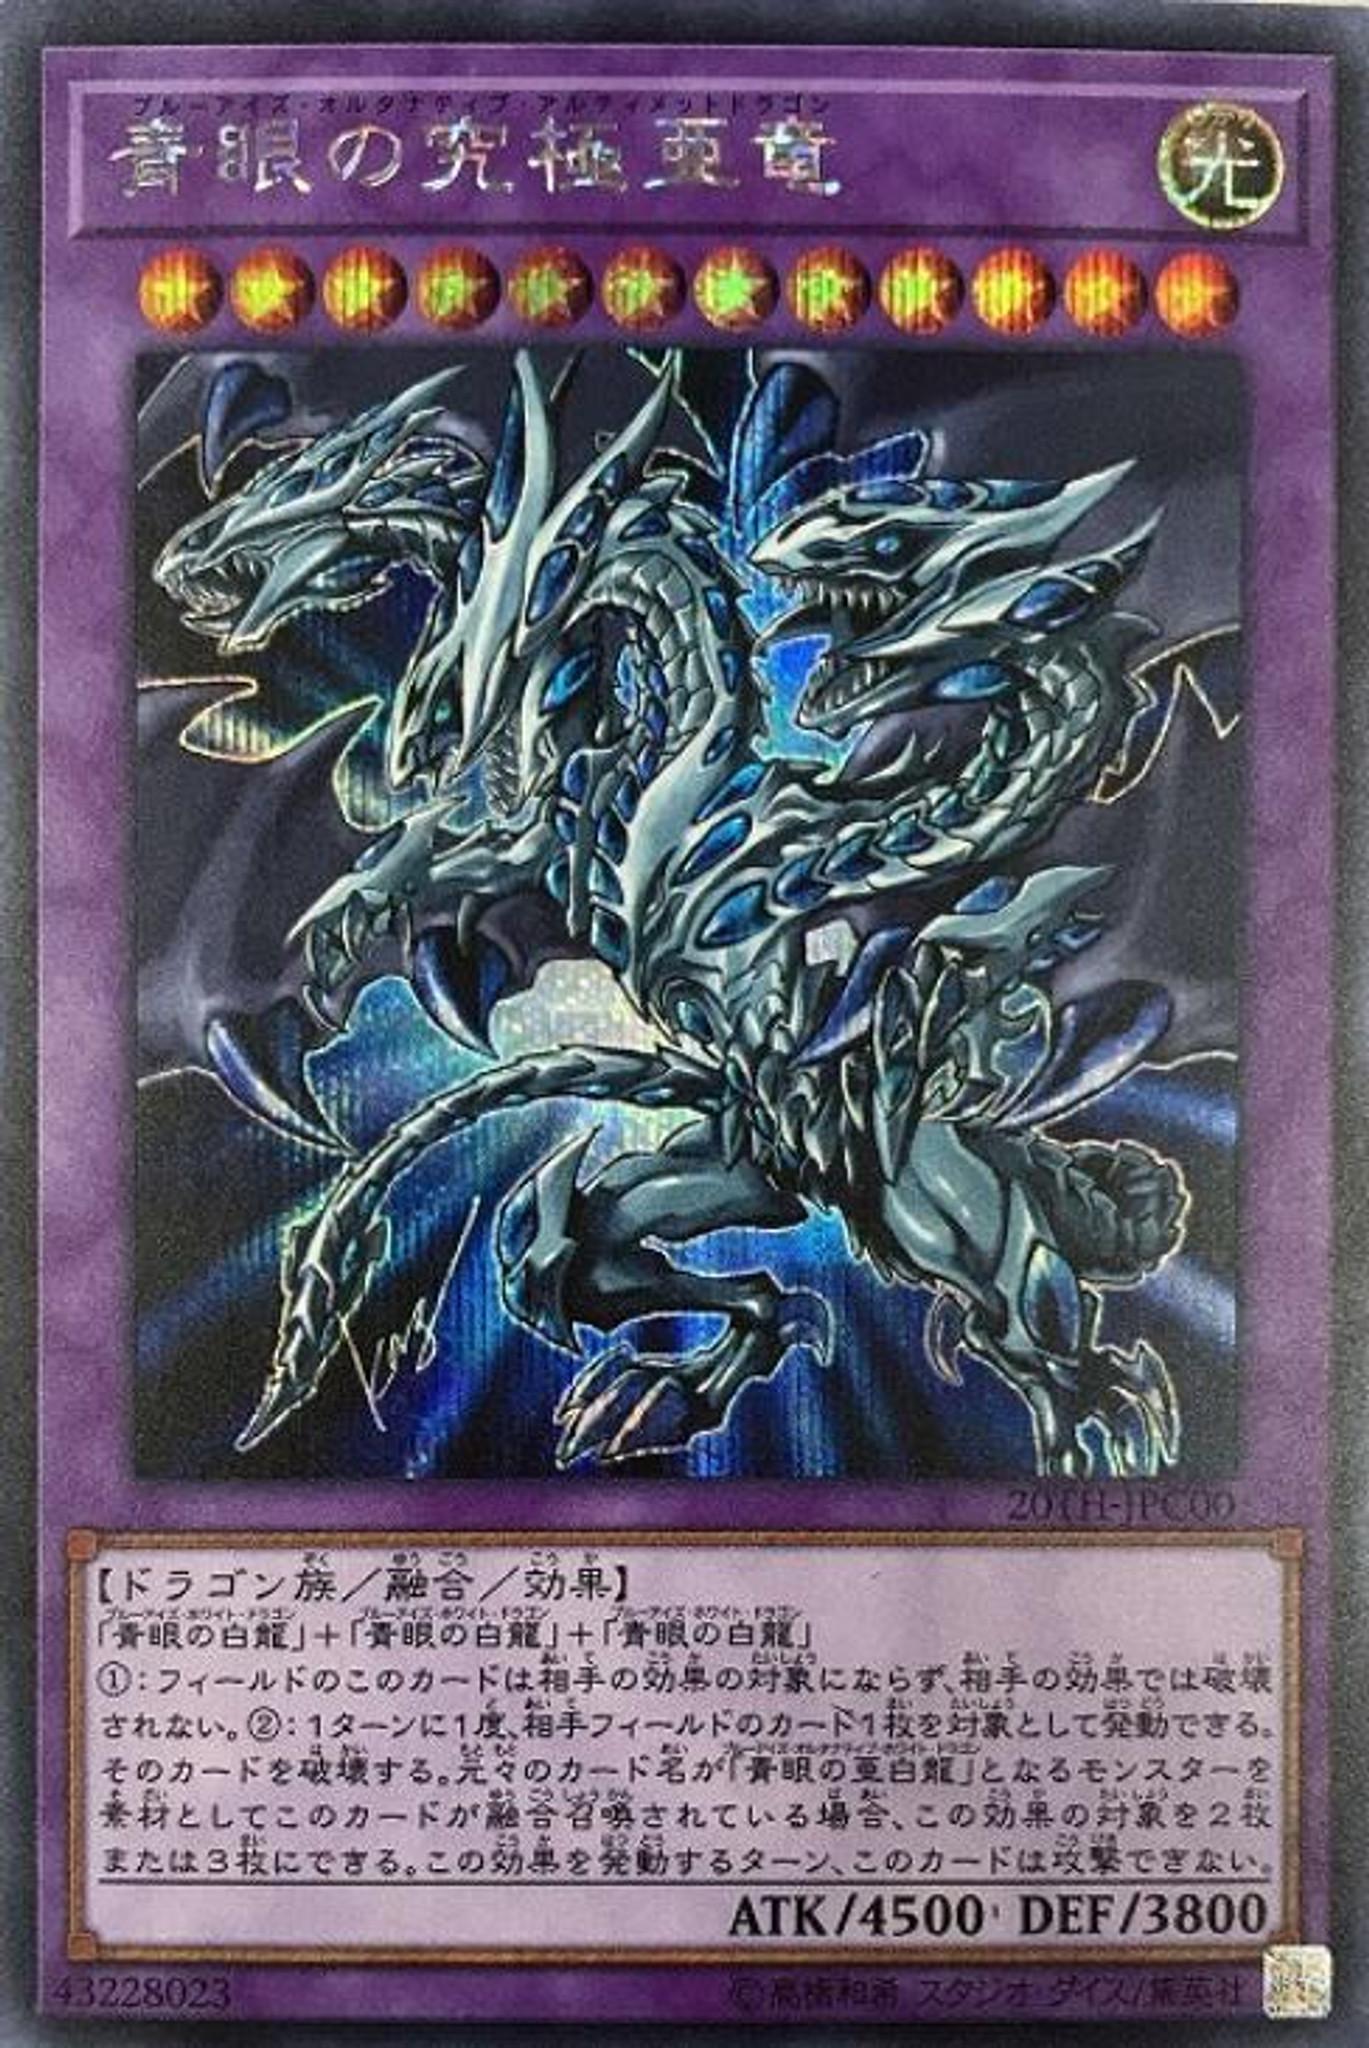 Blue Eyes Alternative Ultimate Dragon 20th-JPC00 20th secret rare YuGiOh